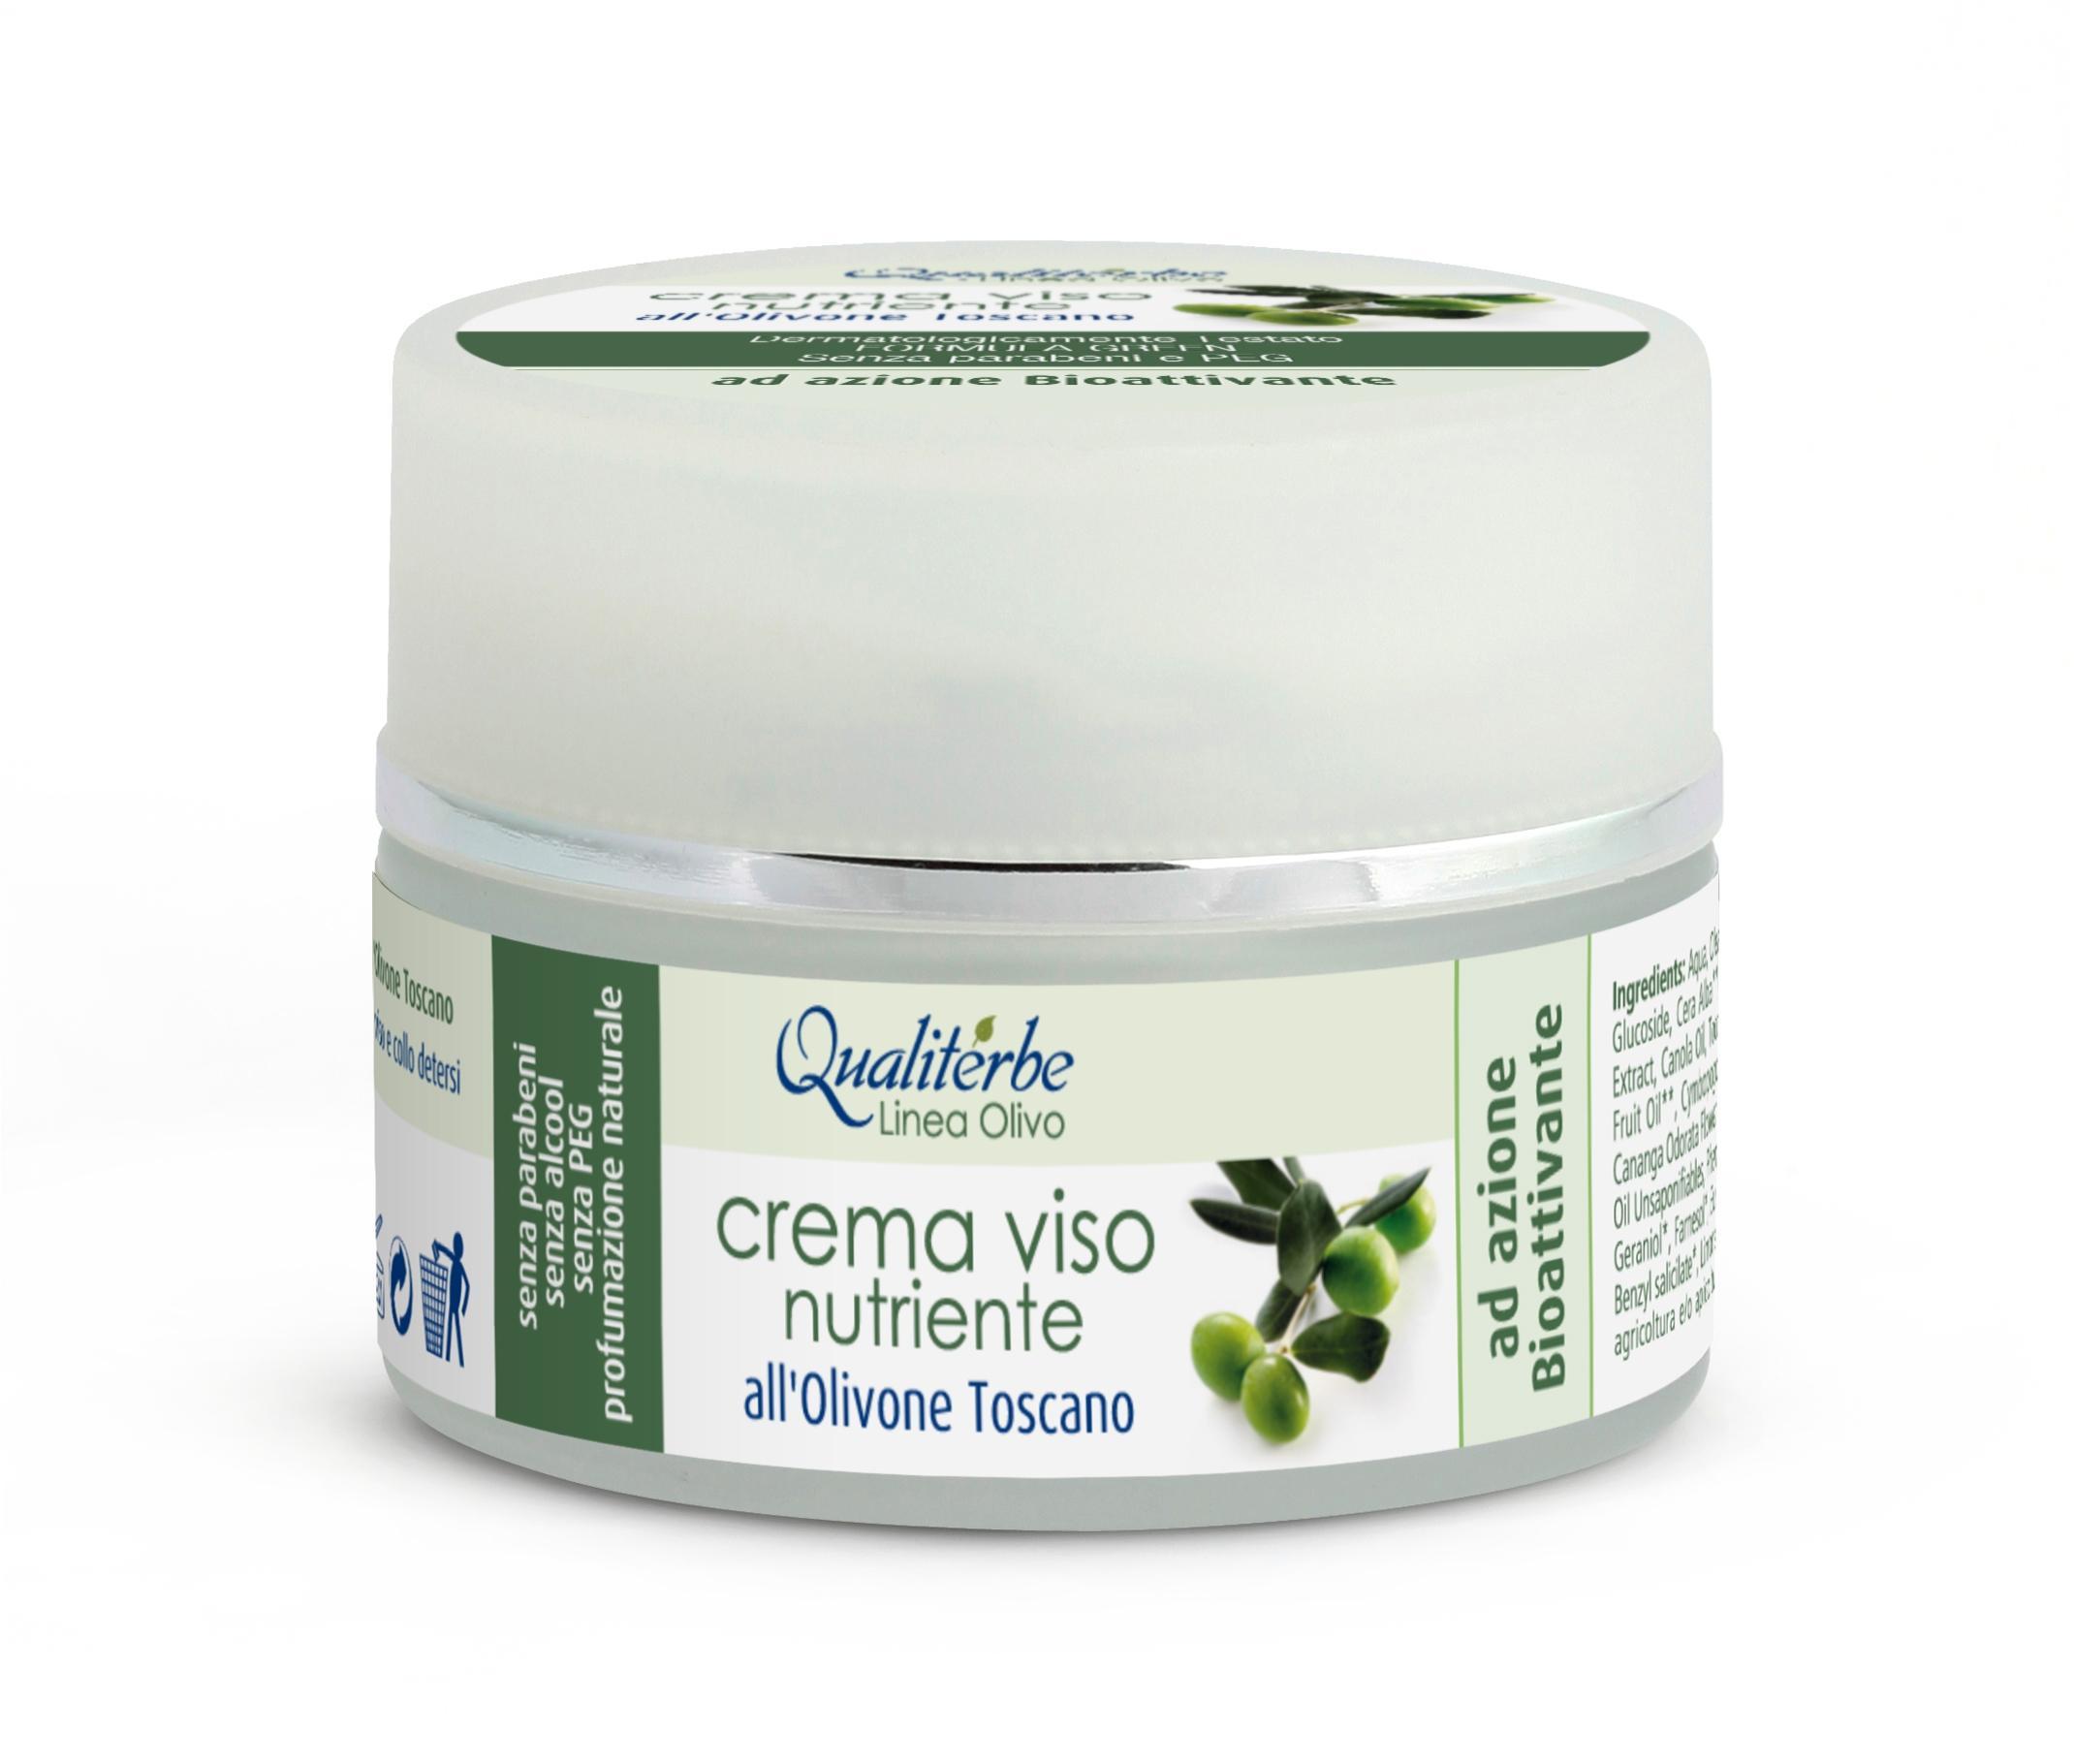 Crema Viso Nutriente all'Olivone Toscano-SENZA PARABENI